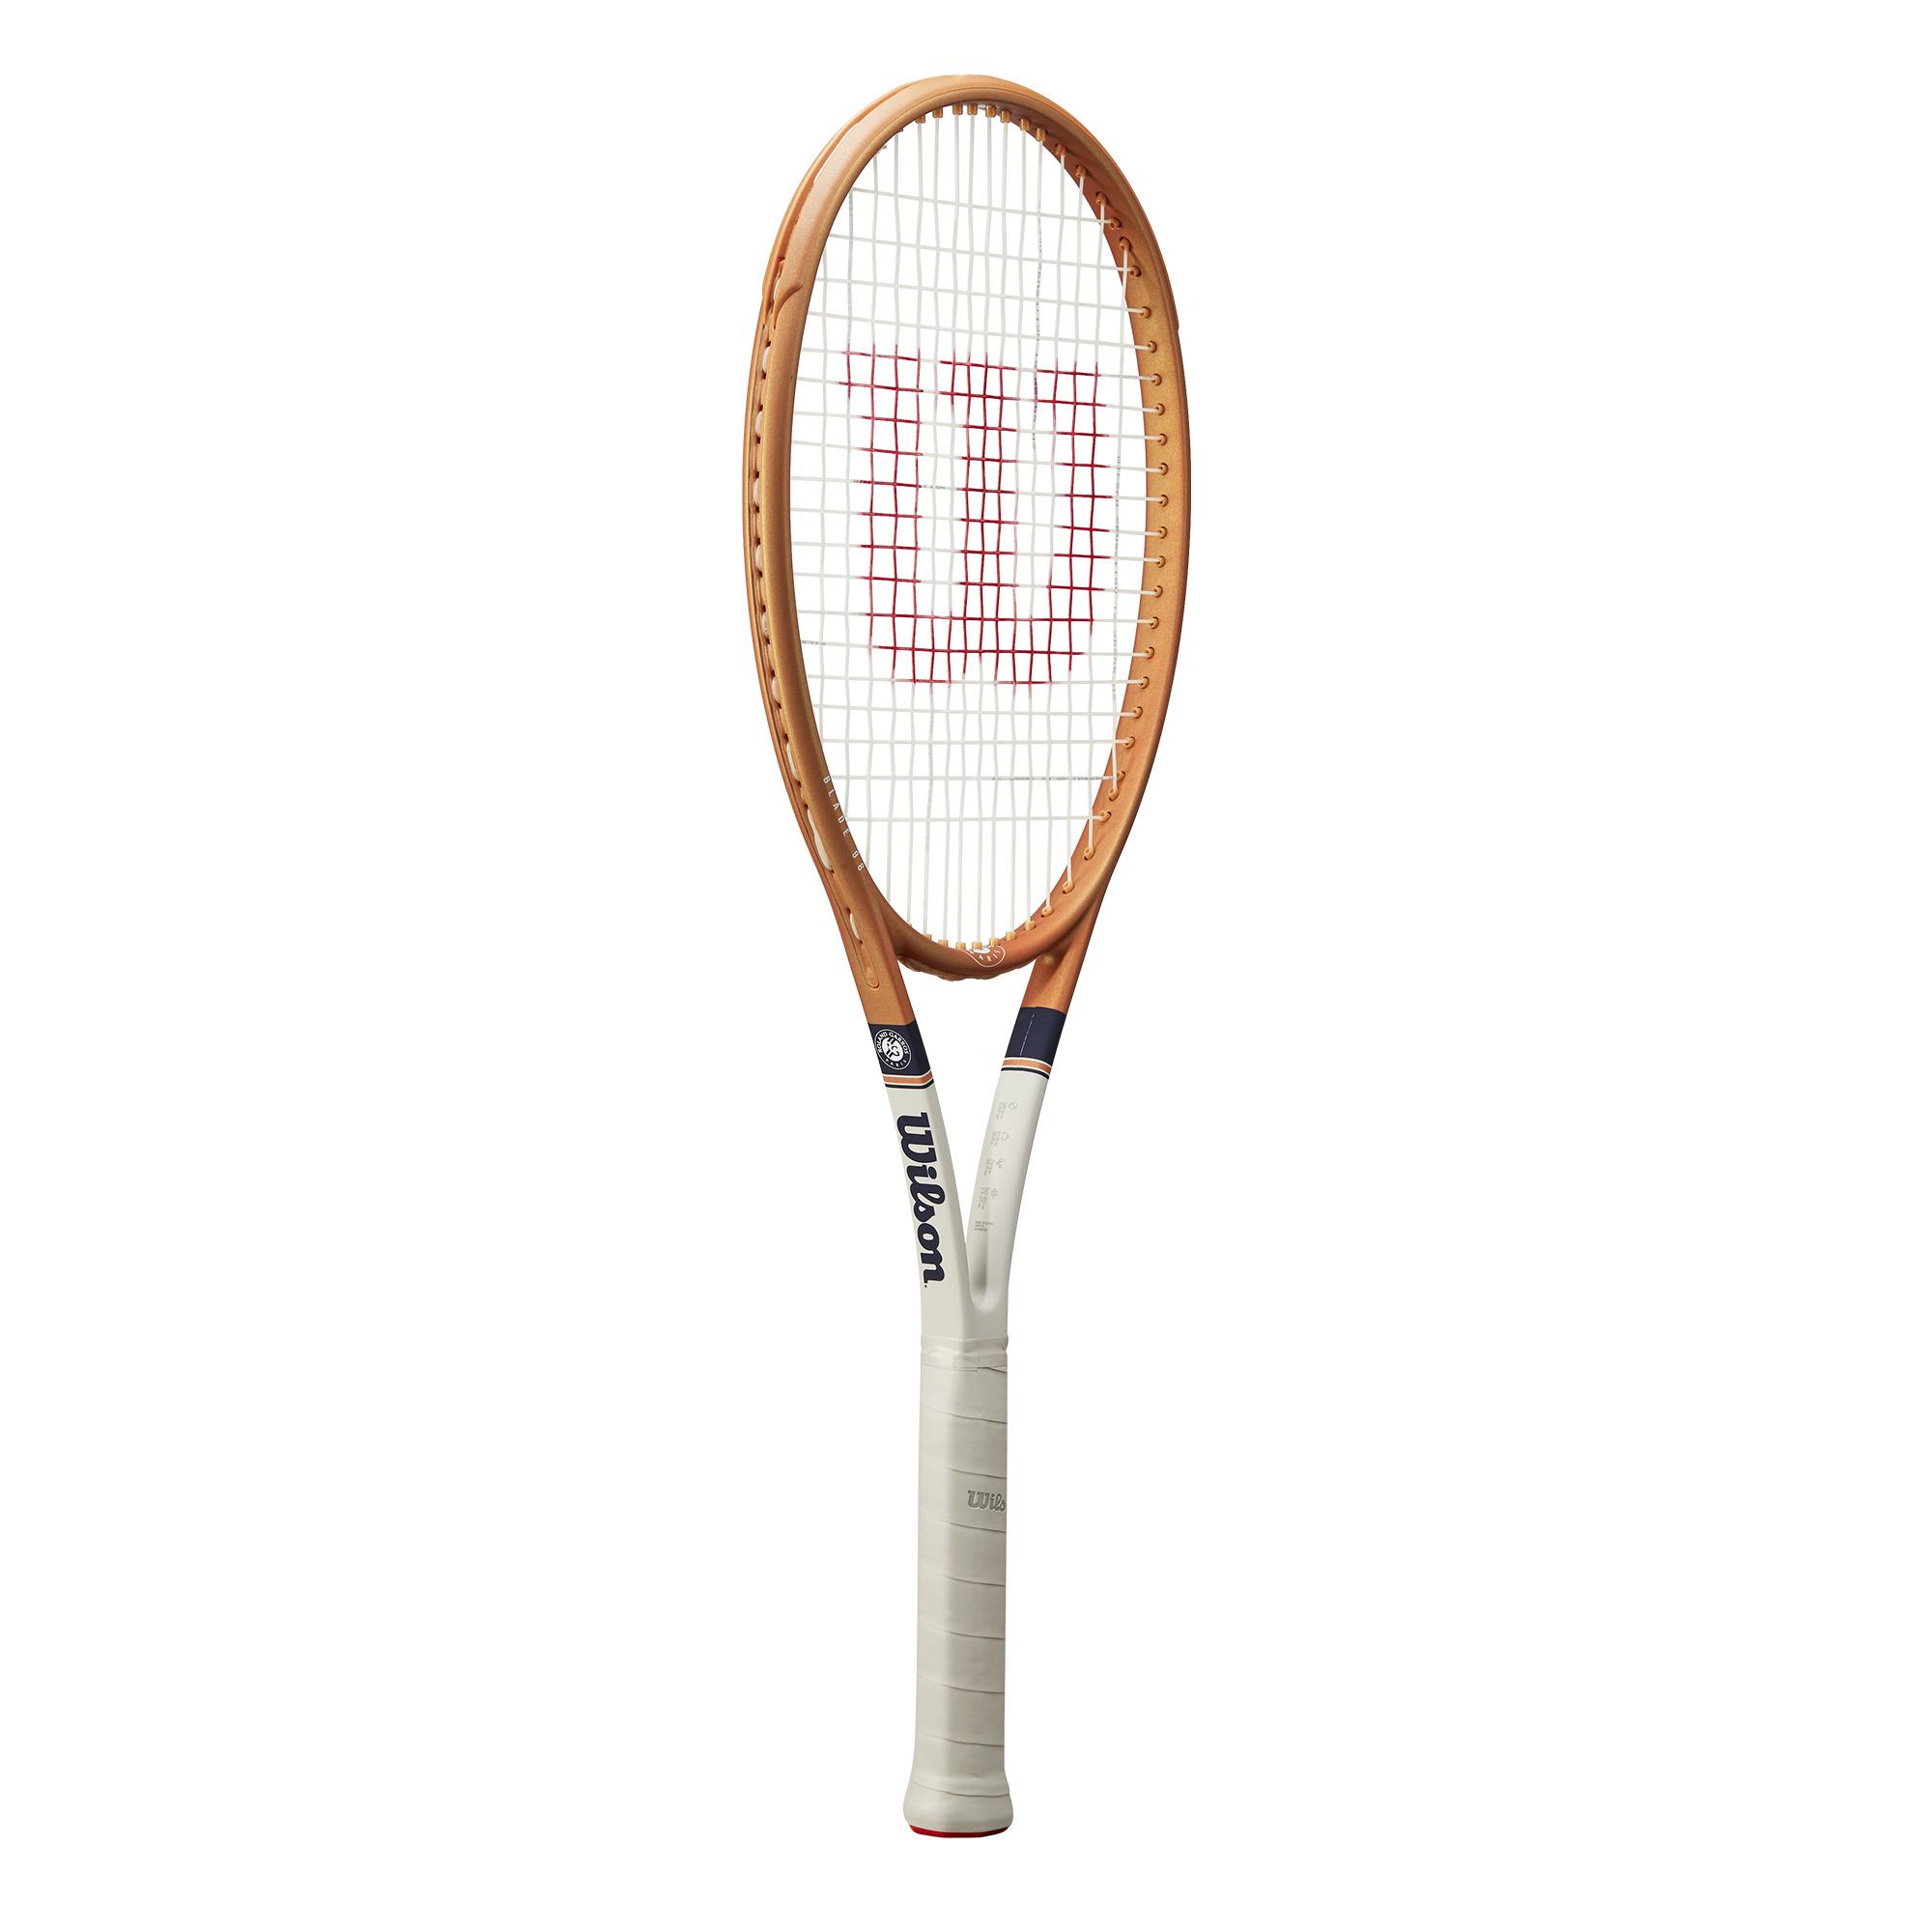 Wilson Blade 98 16/19 v7 Tennis Racquet – Roland Garros